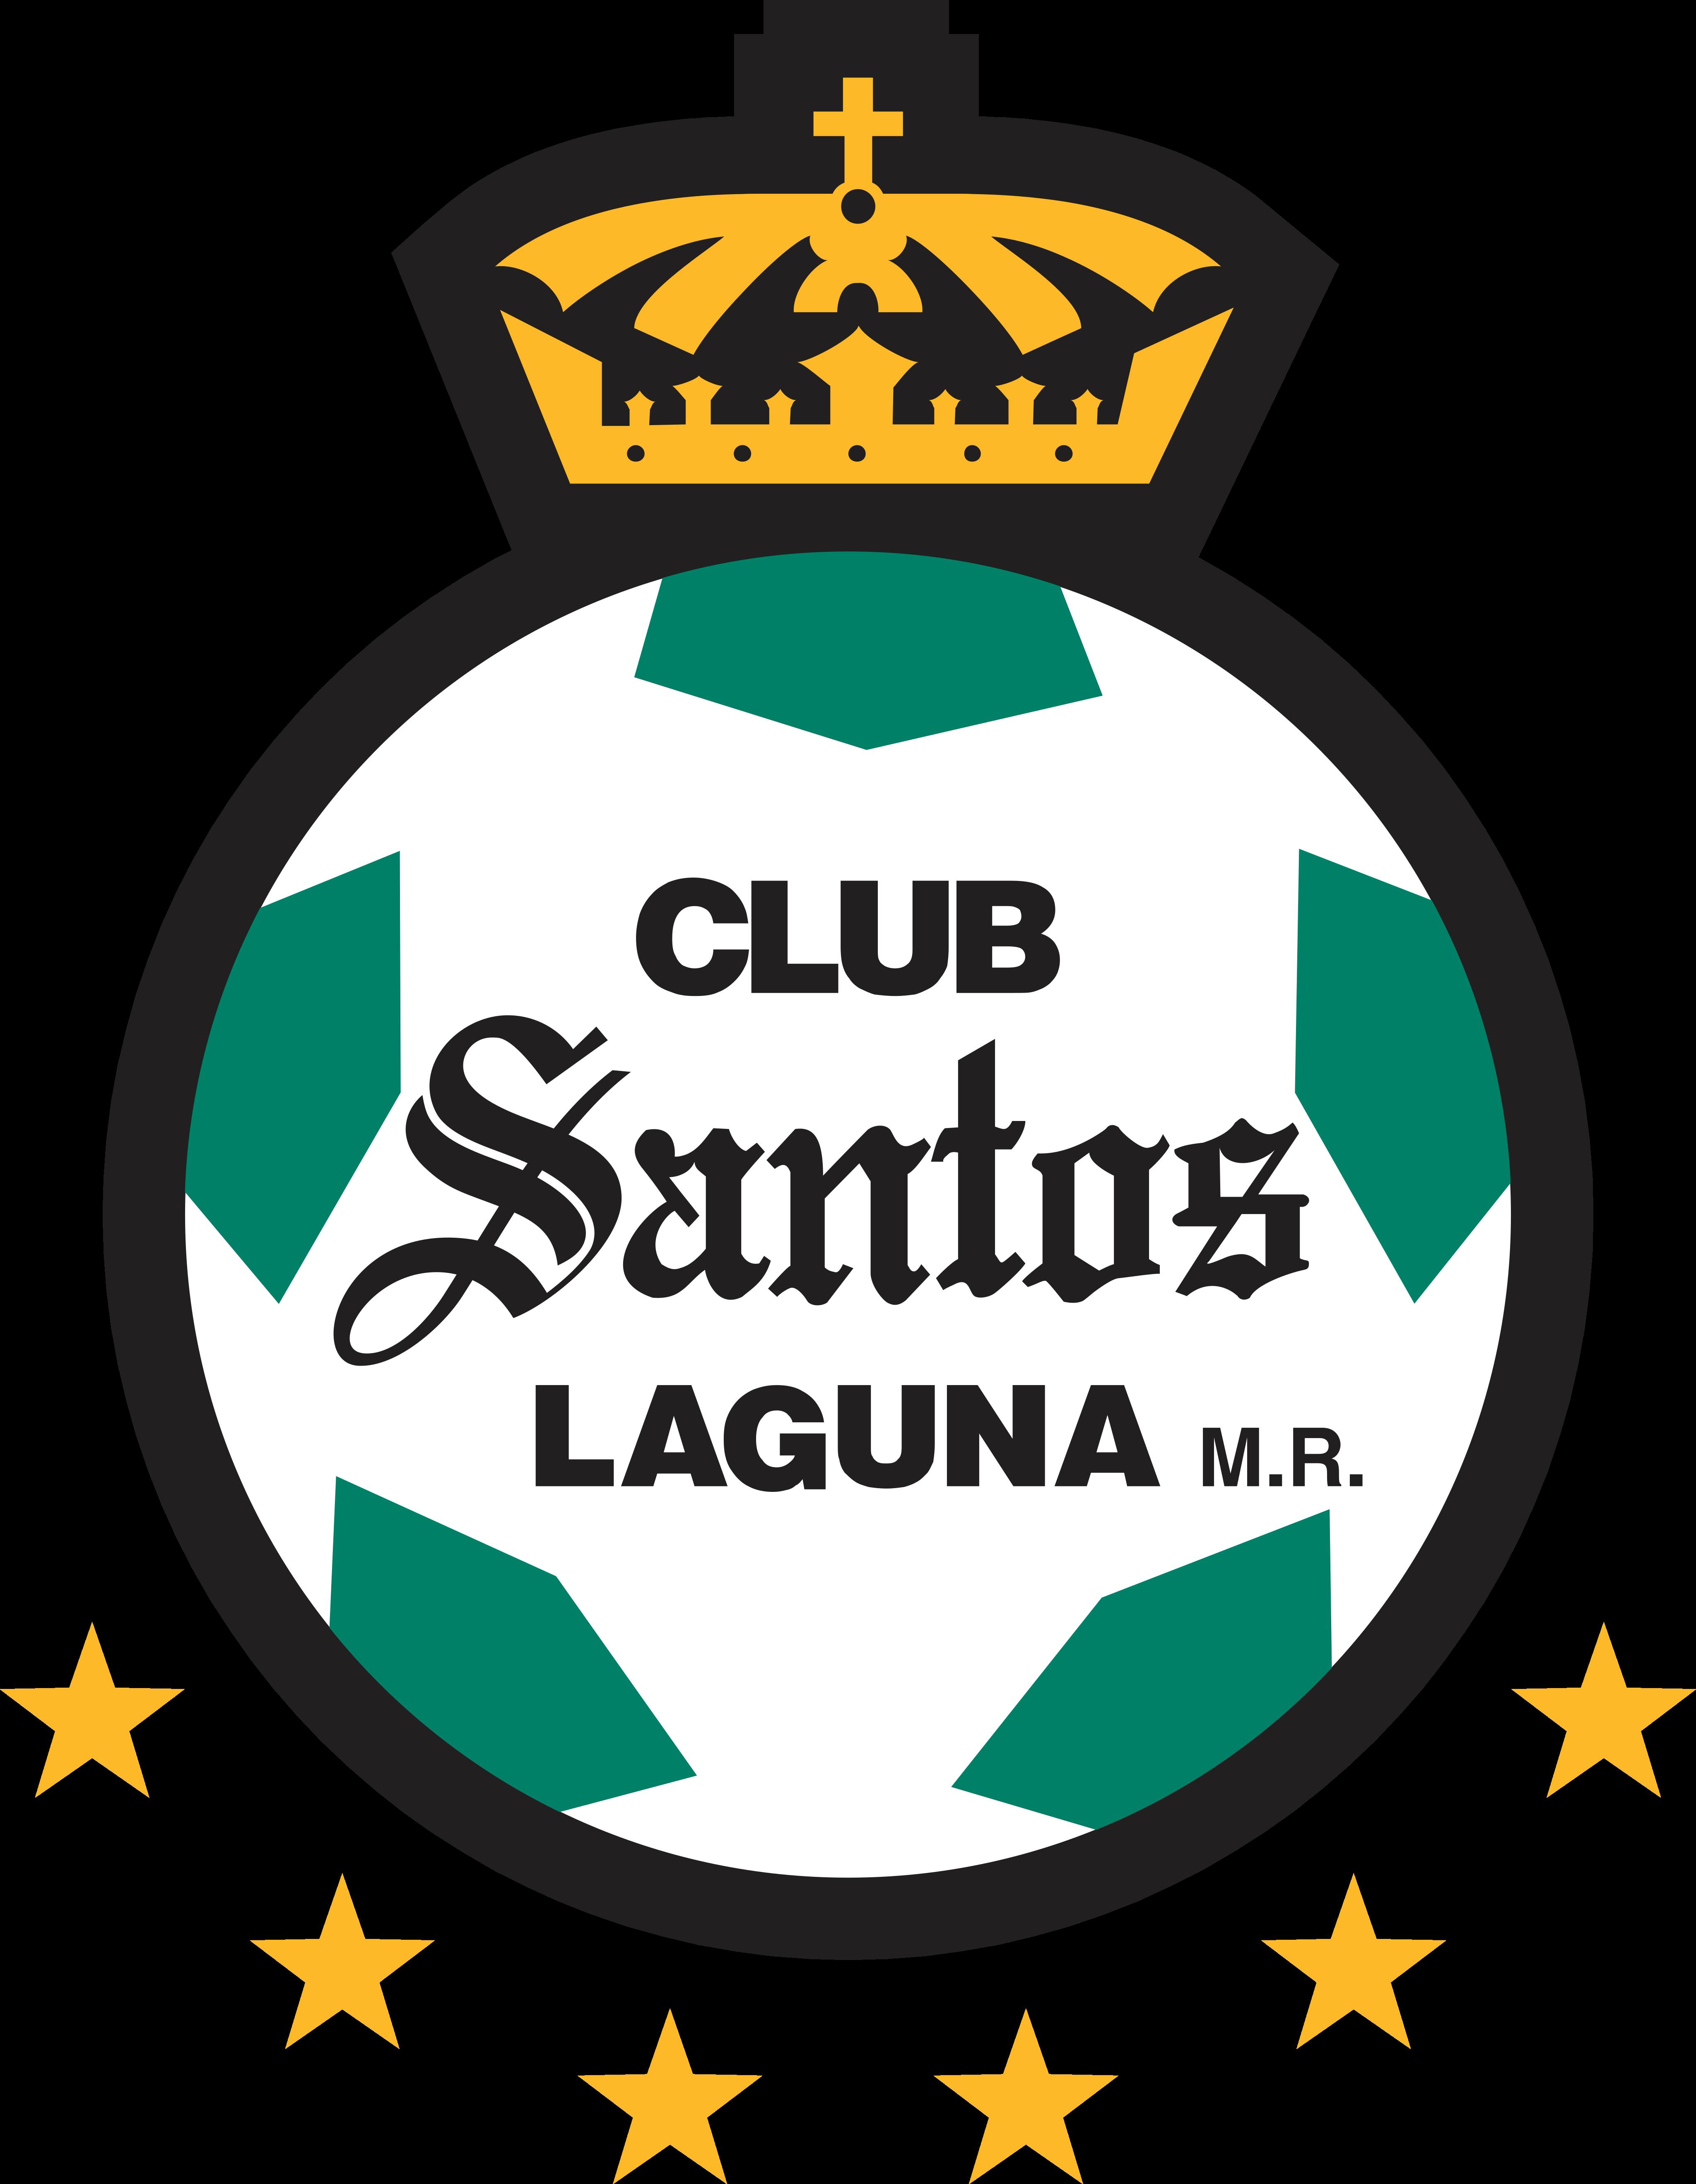 santos laguna logo - Club Santos Laguna Logo - Escudo